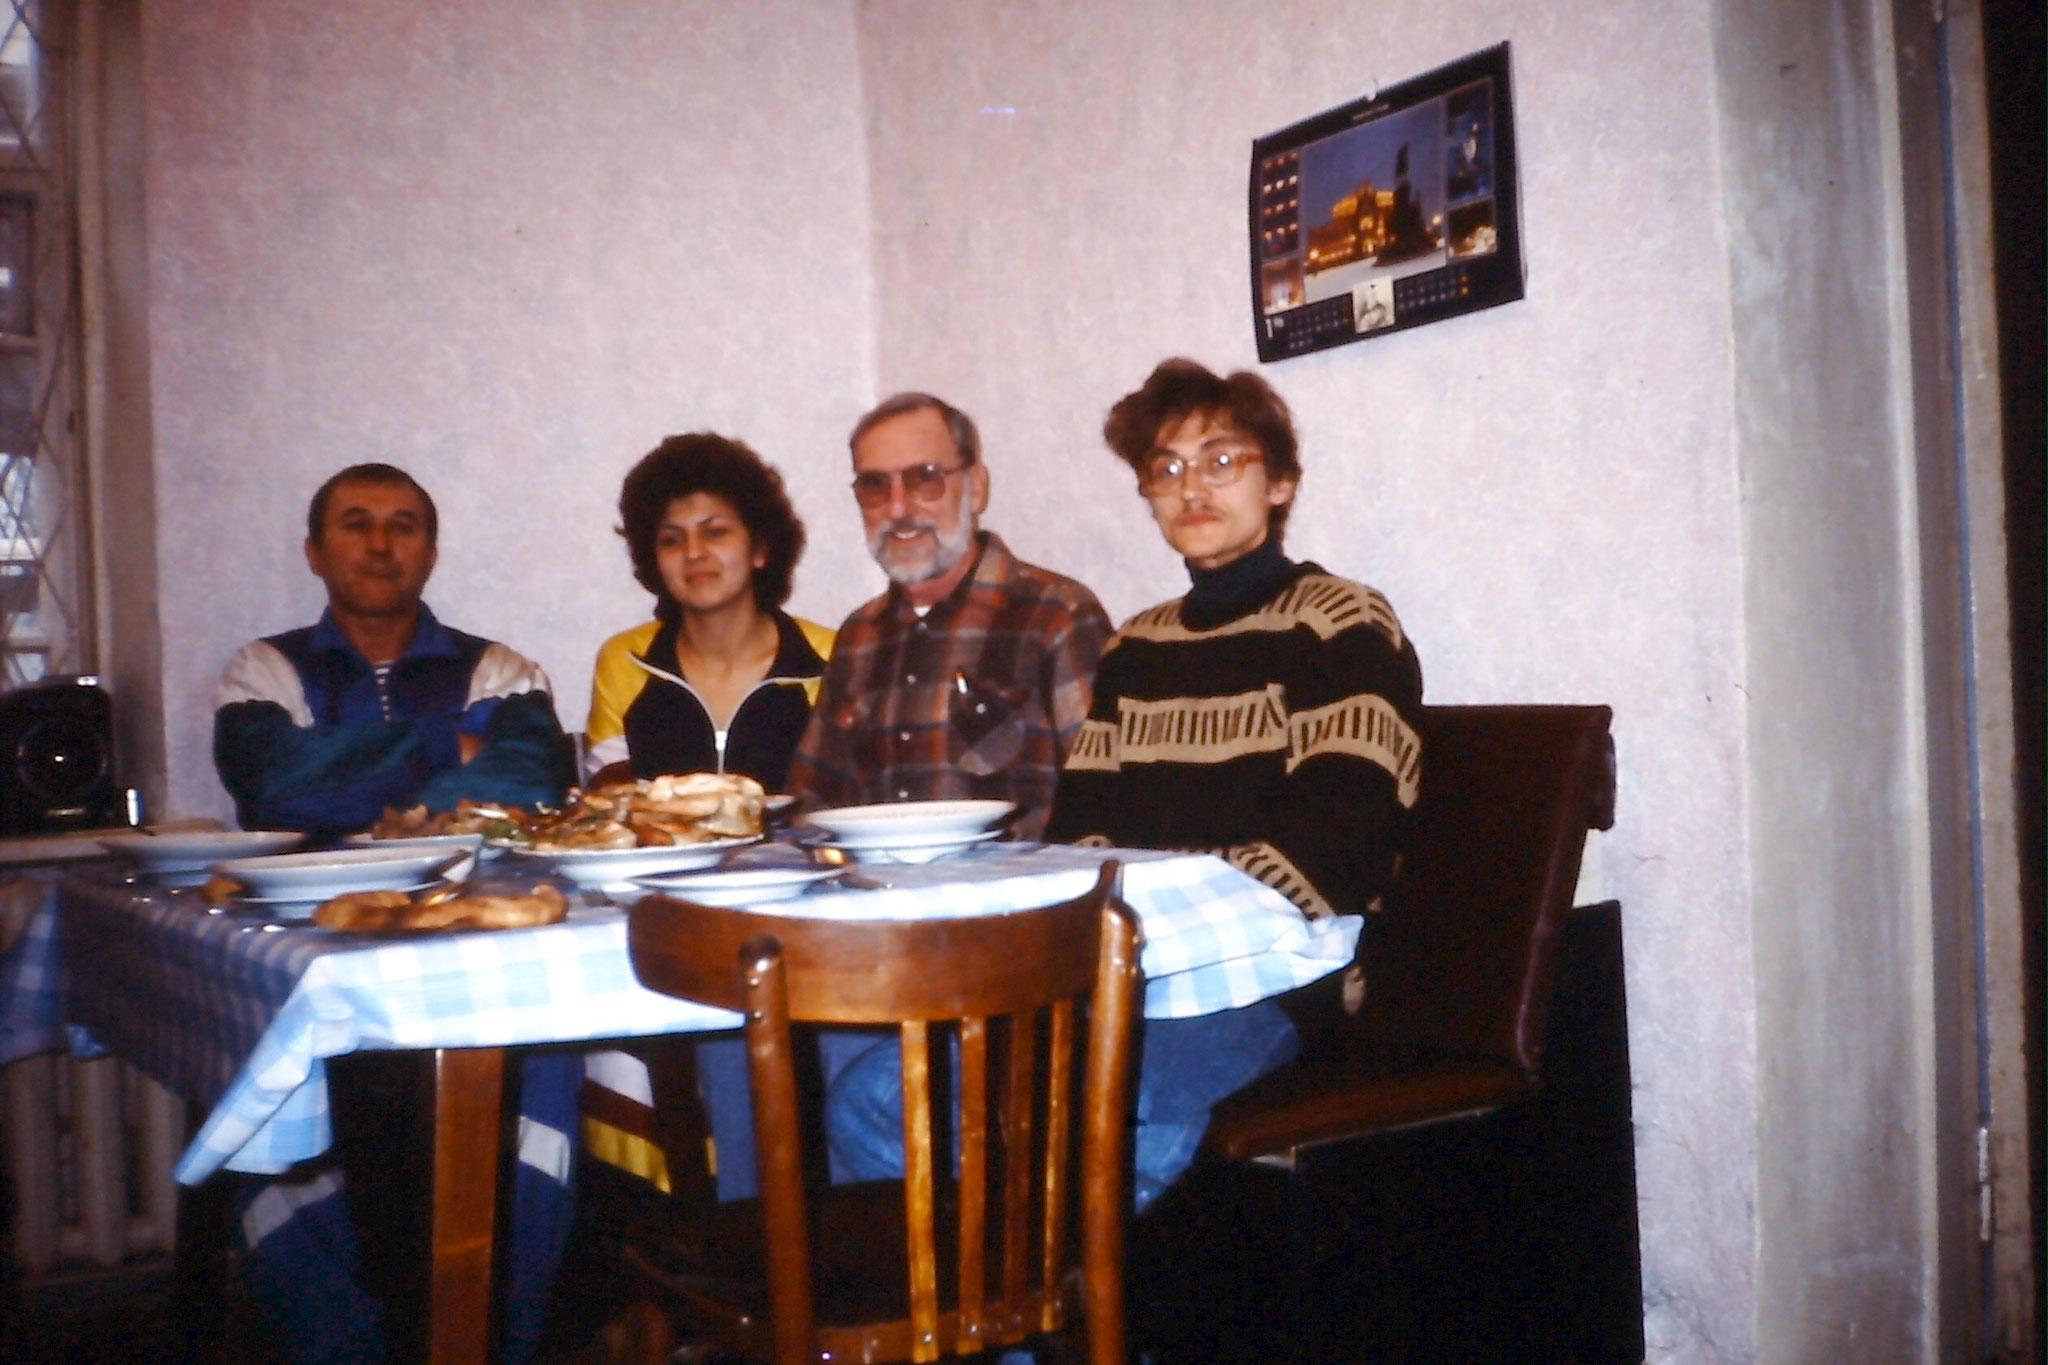 v.l.n.r.: Mischa, Tanja, Father John und Andrej